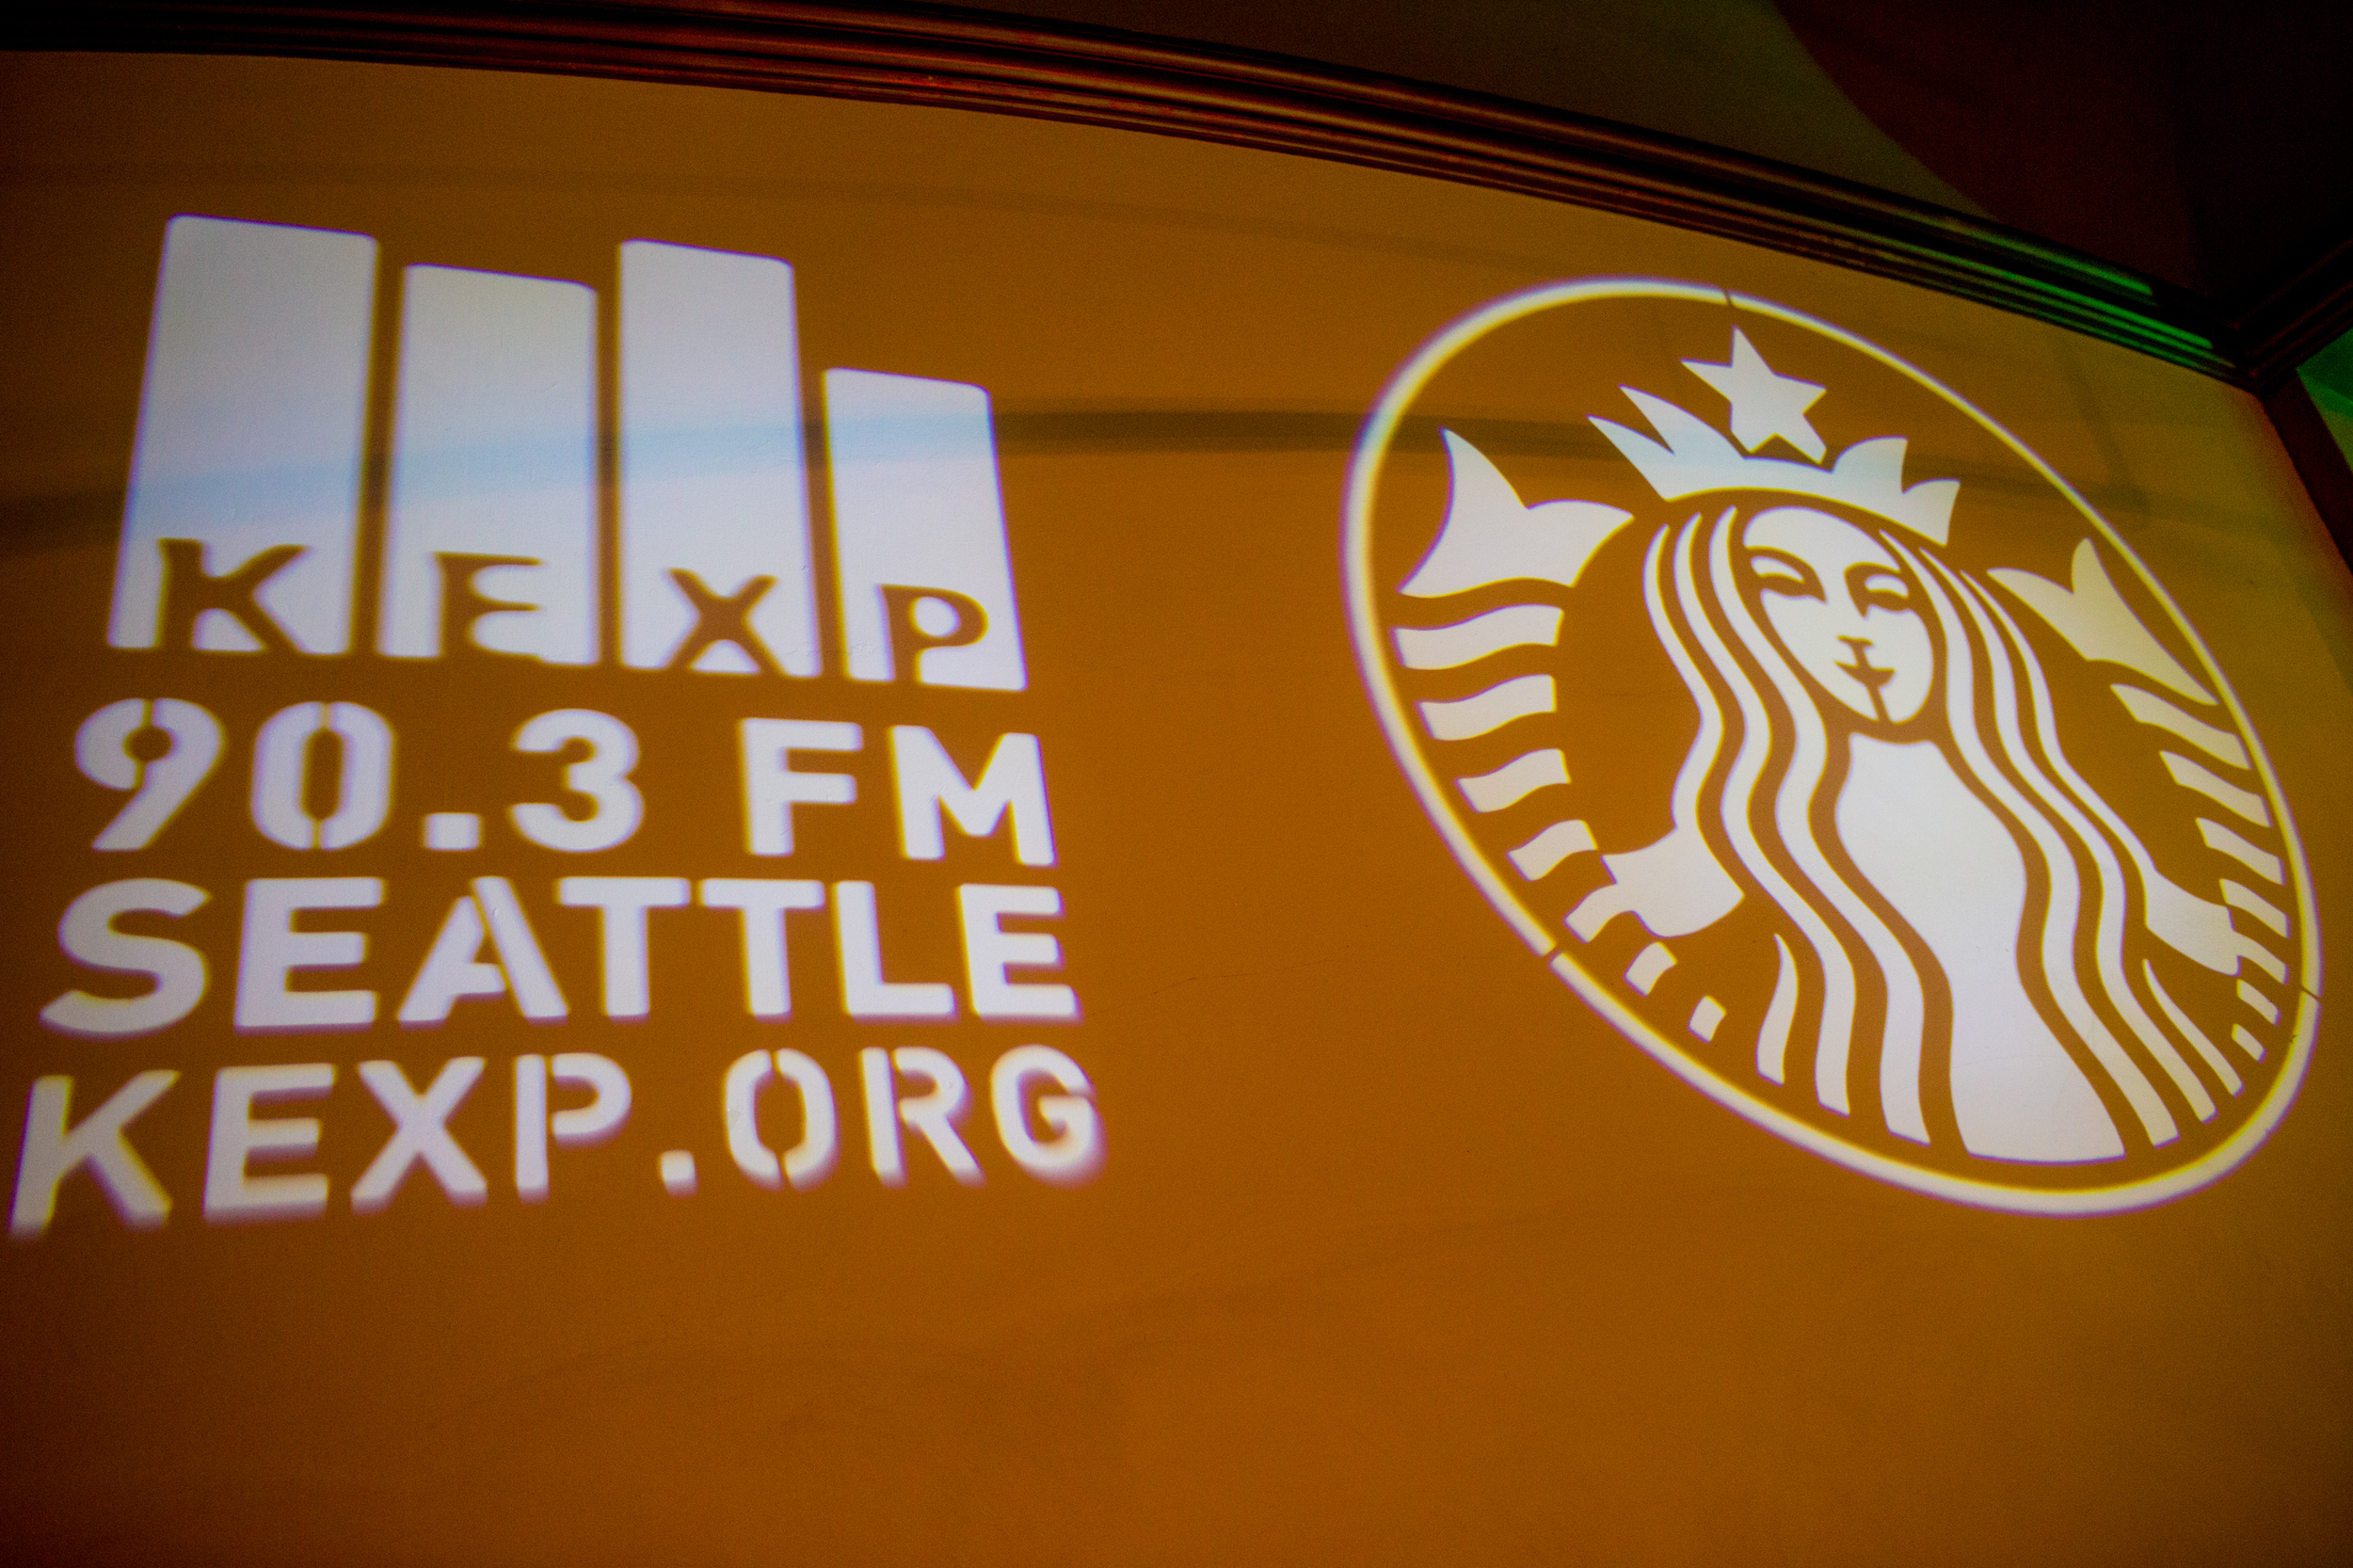 Starbucks & KEXP